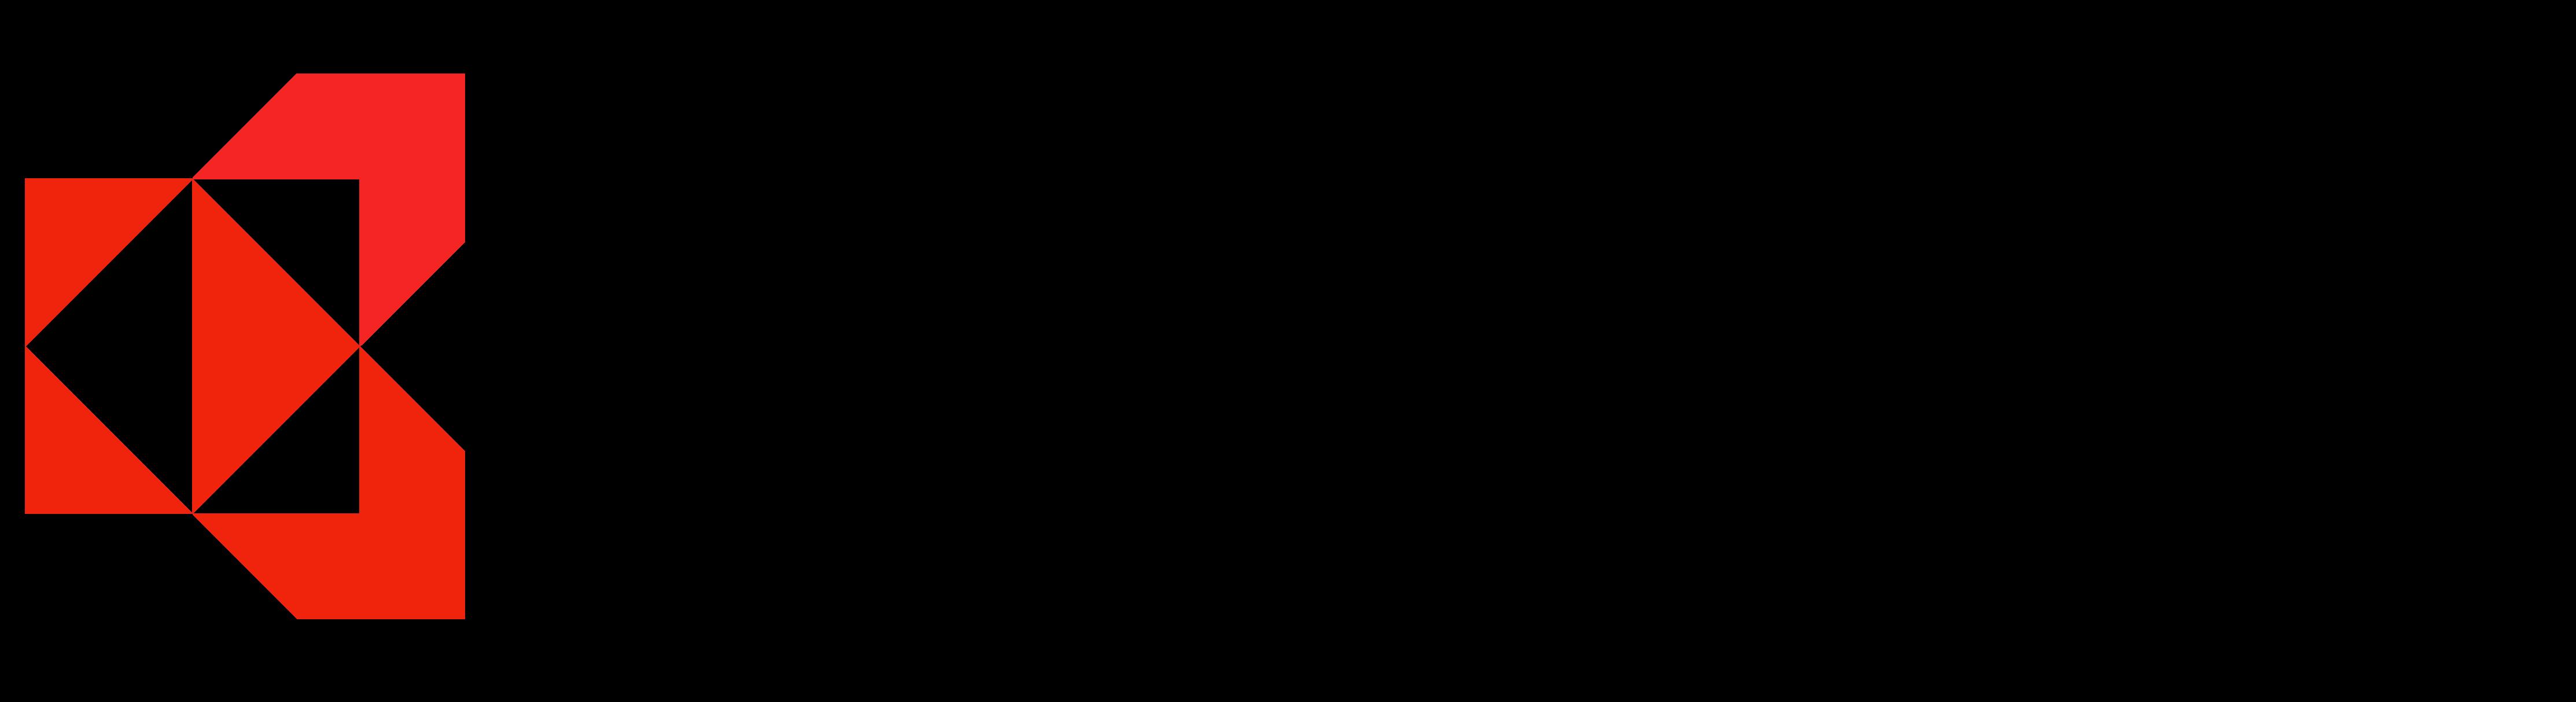 kisspng-kyocera-logo-logo-5ab8e2f577c890.0925450015220661654907